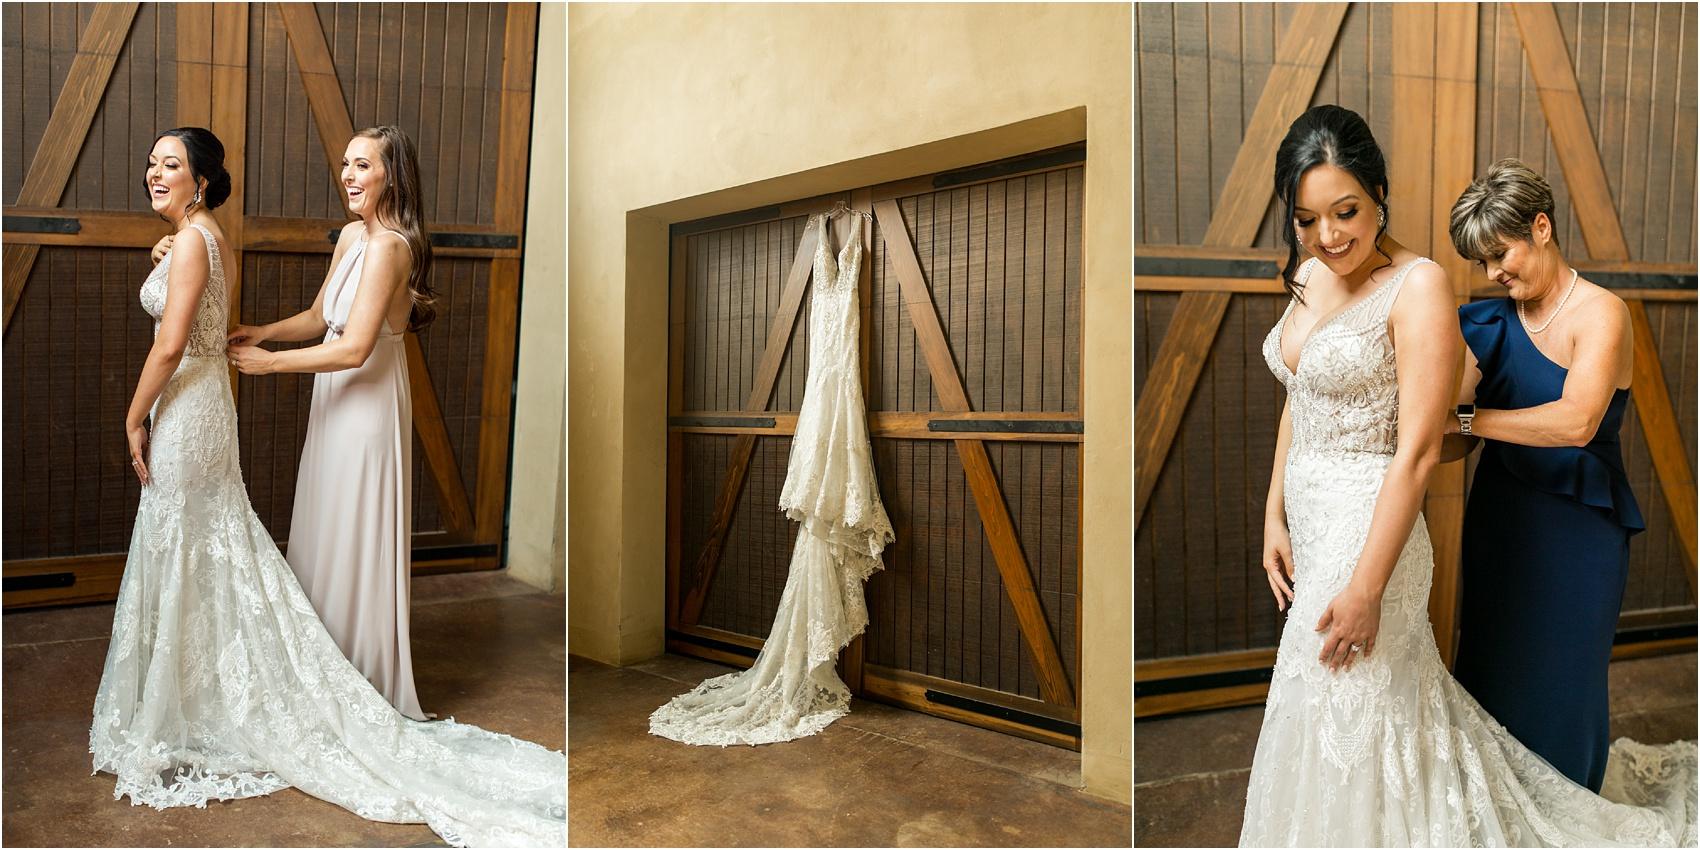 Savannah Eve Photography- Turnbill-Gilgan Wedding- Blog-10.jpg